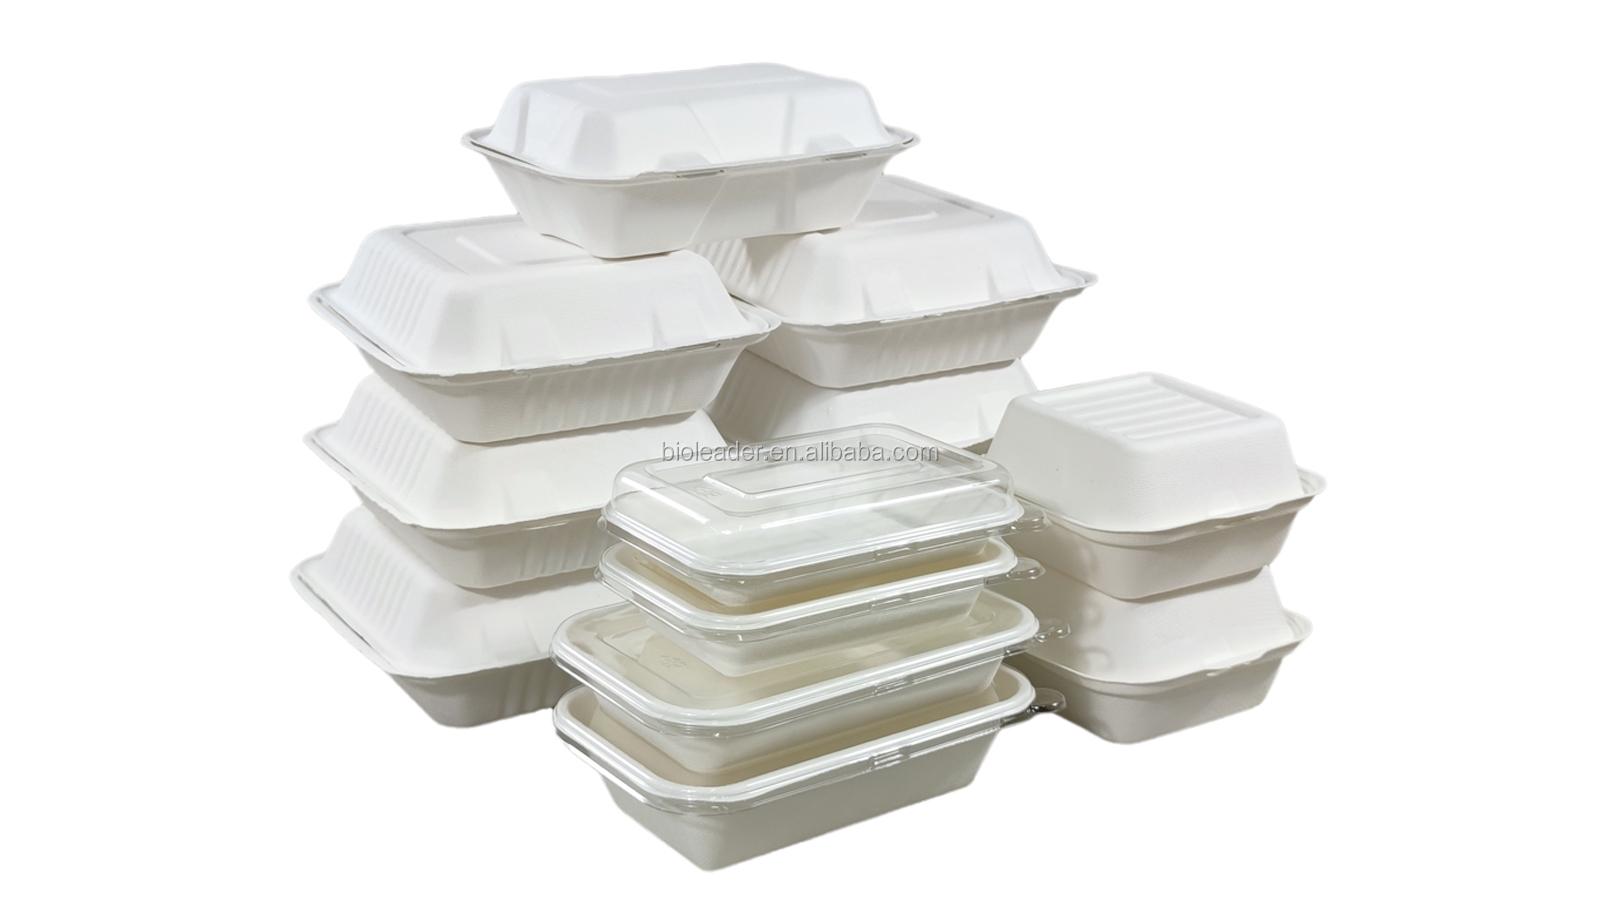 100% Biodegradable อ้อยภาชนะบรรจุอาหาร